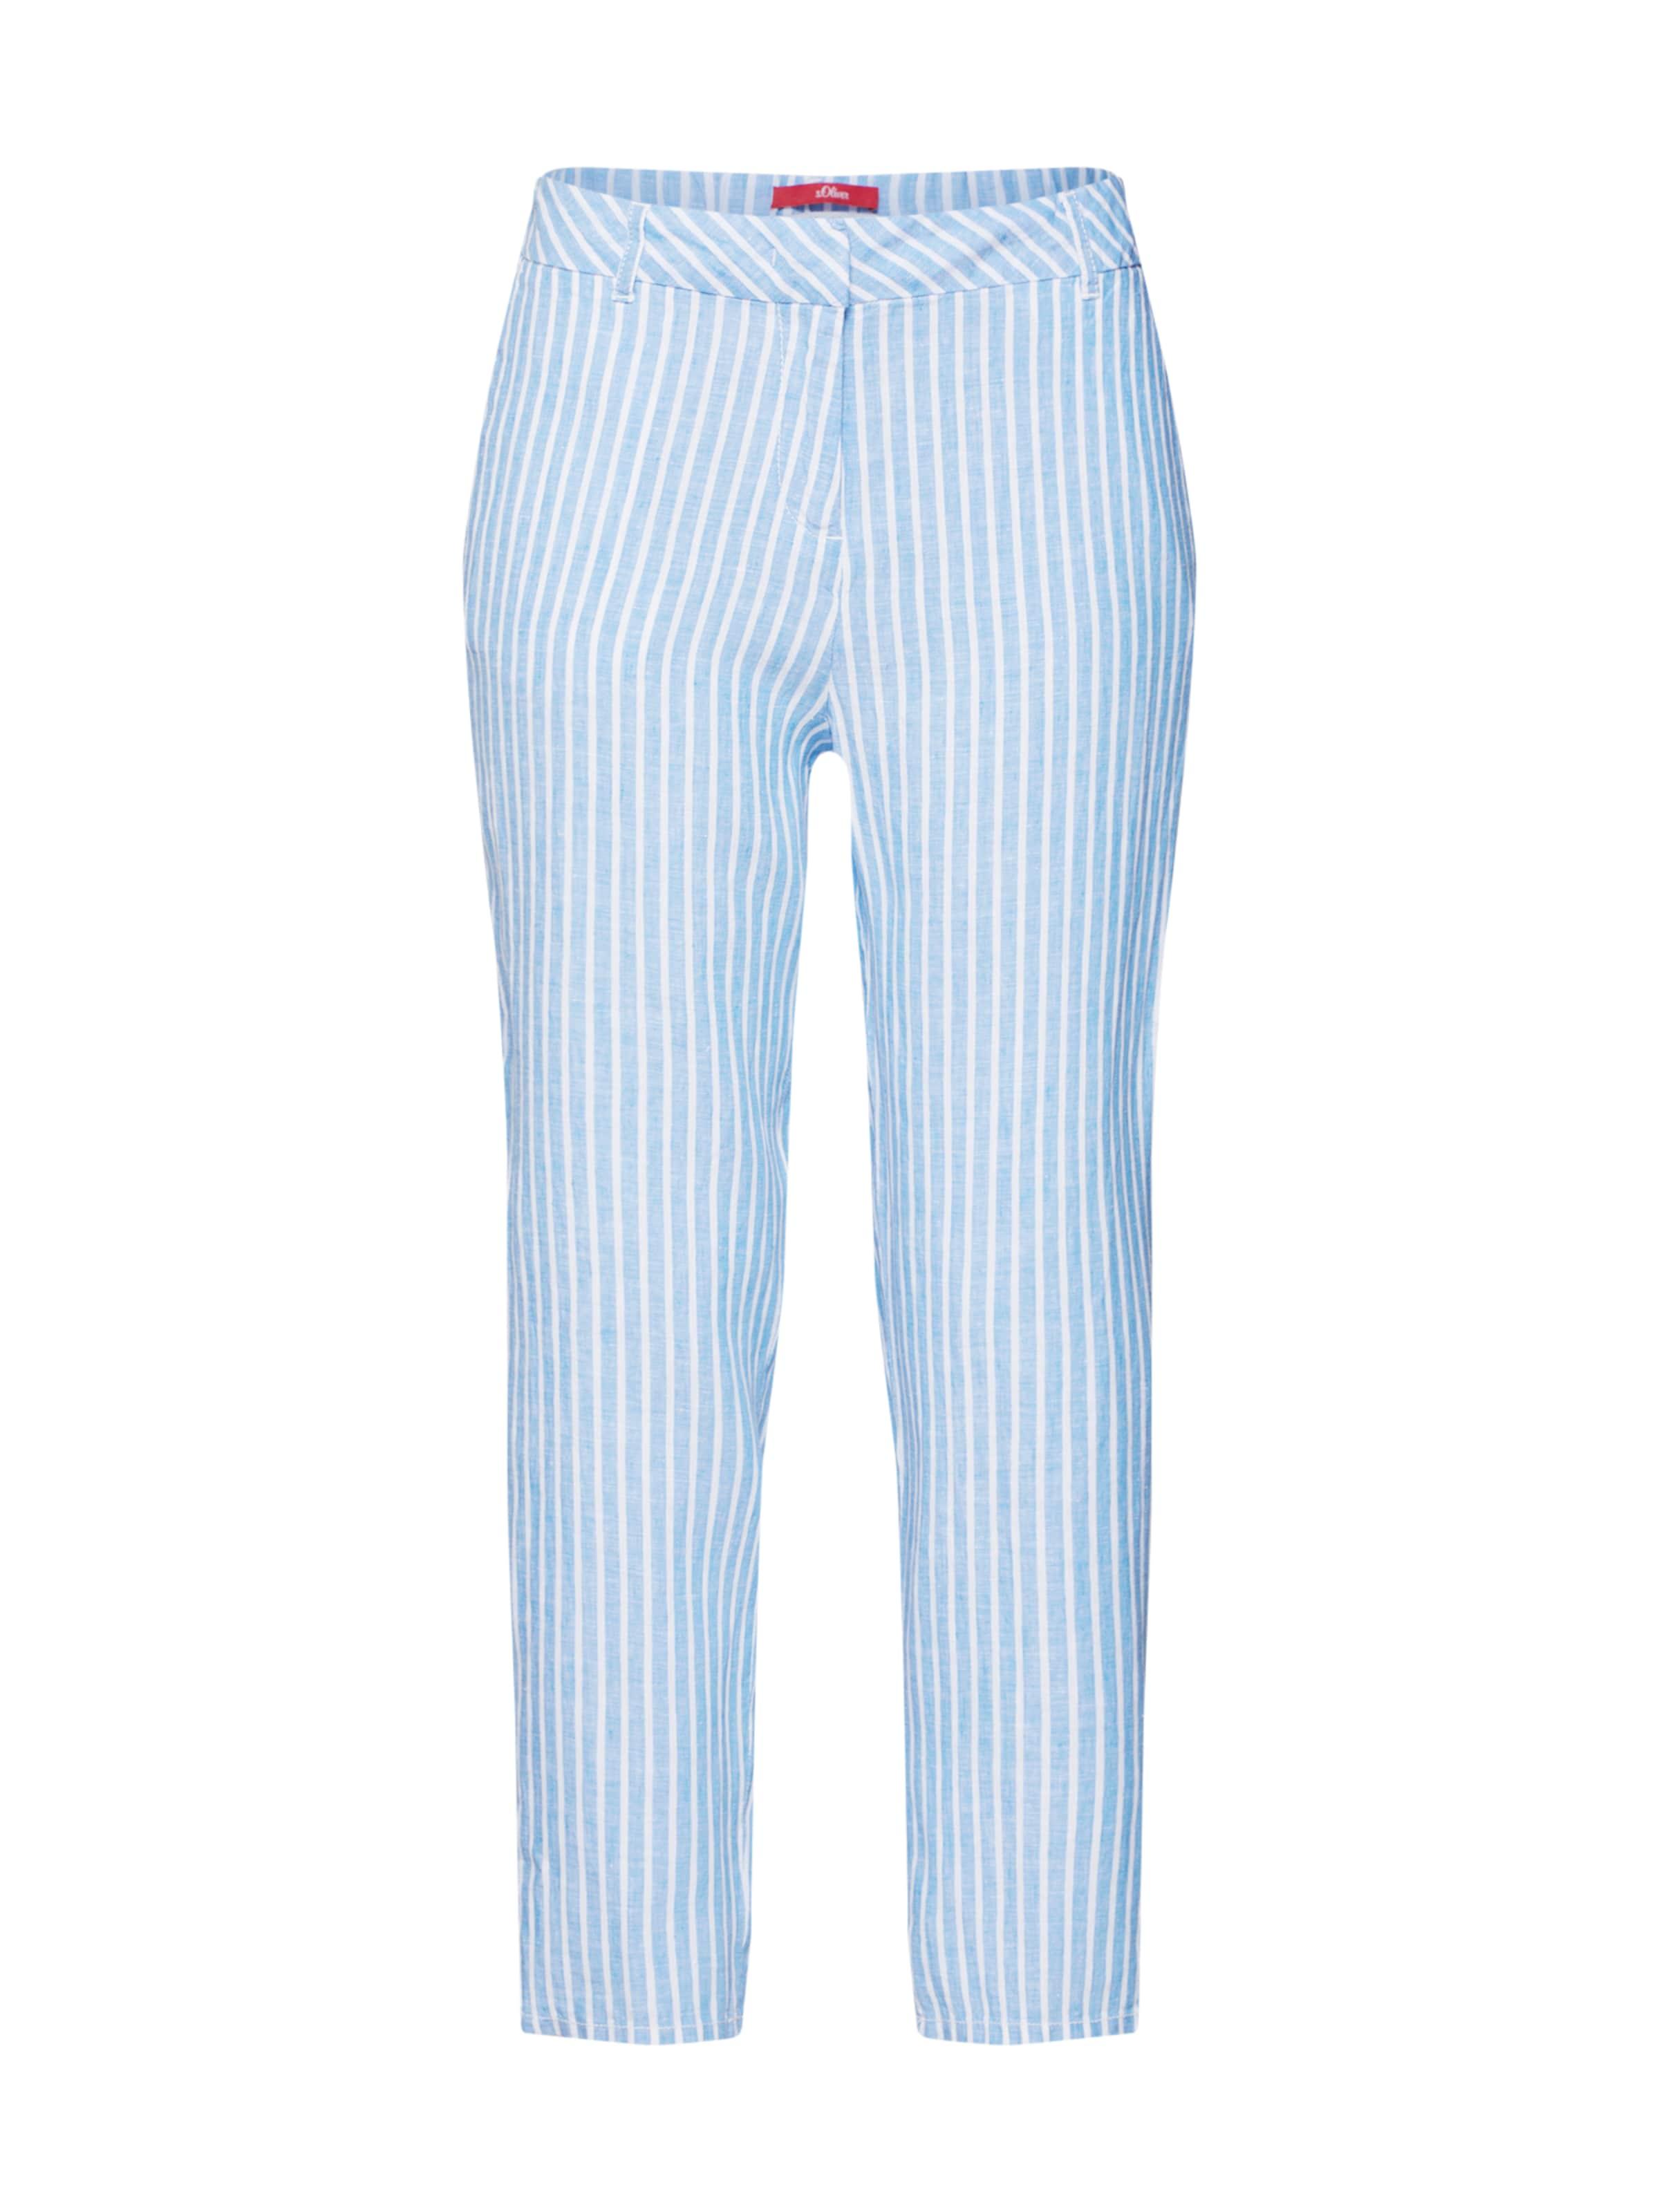 Red S En Clair Label Bleu oliver Pantalon dBrxoeWC